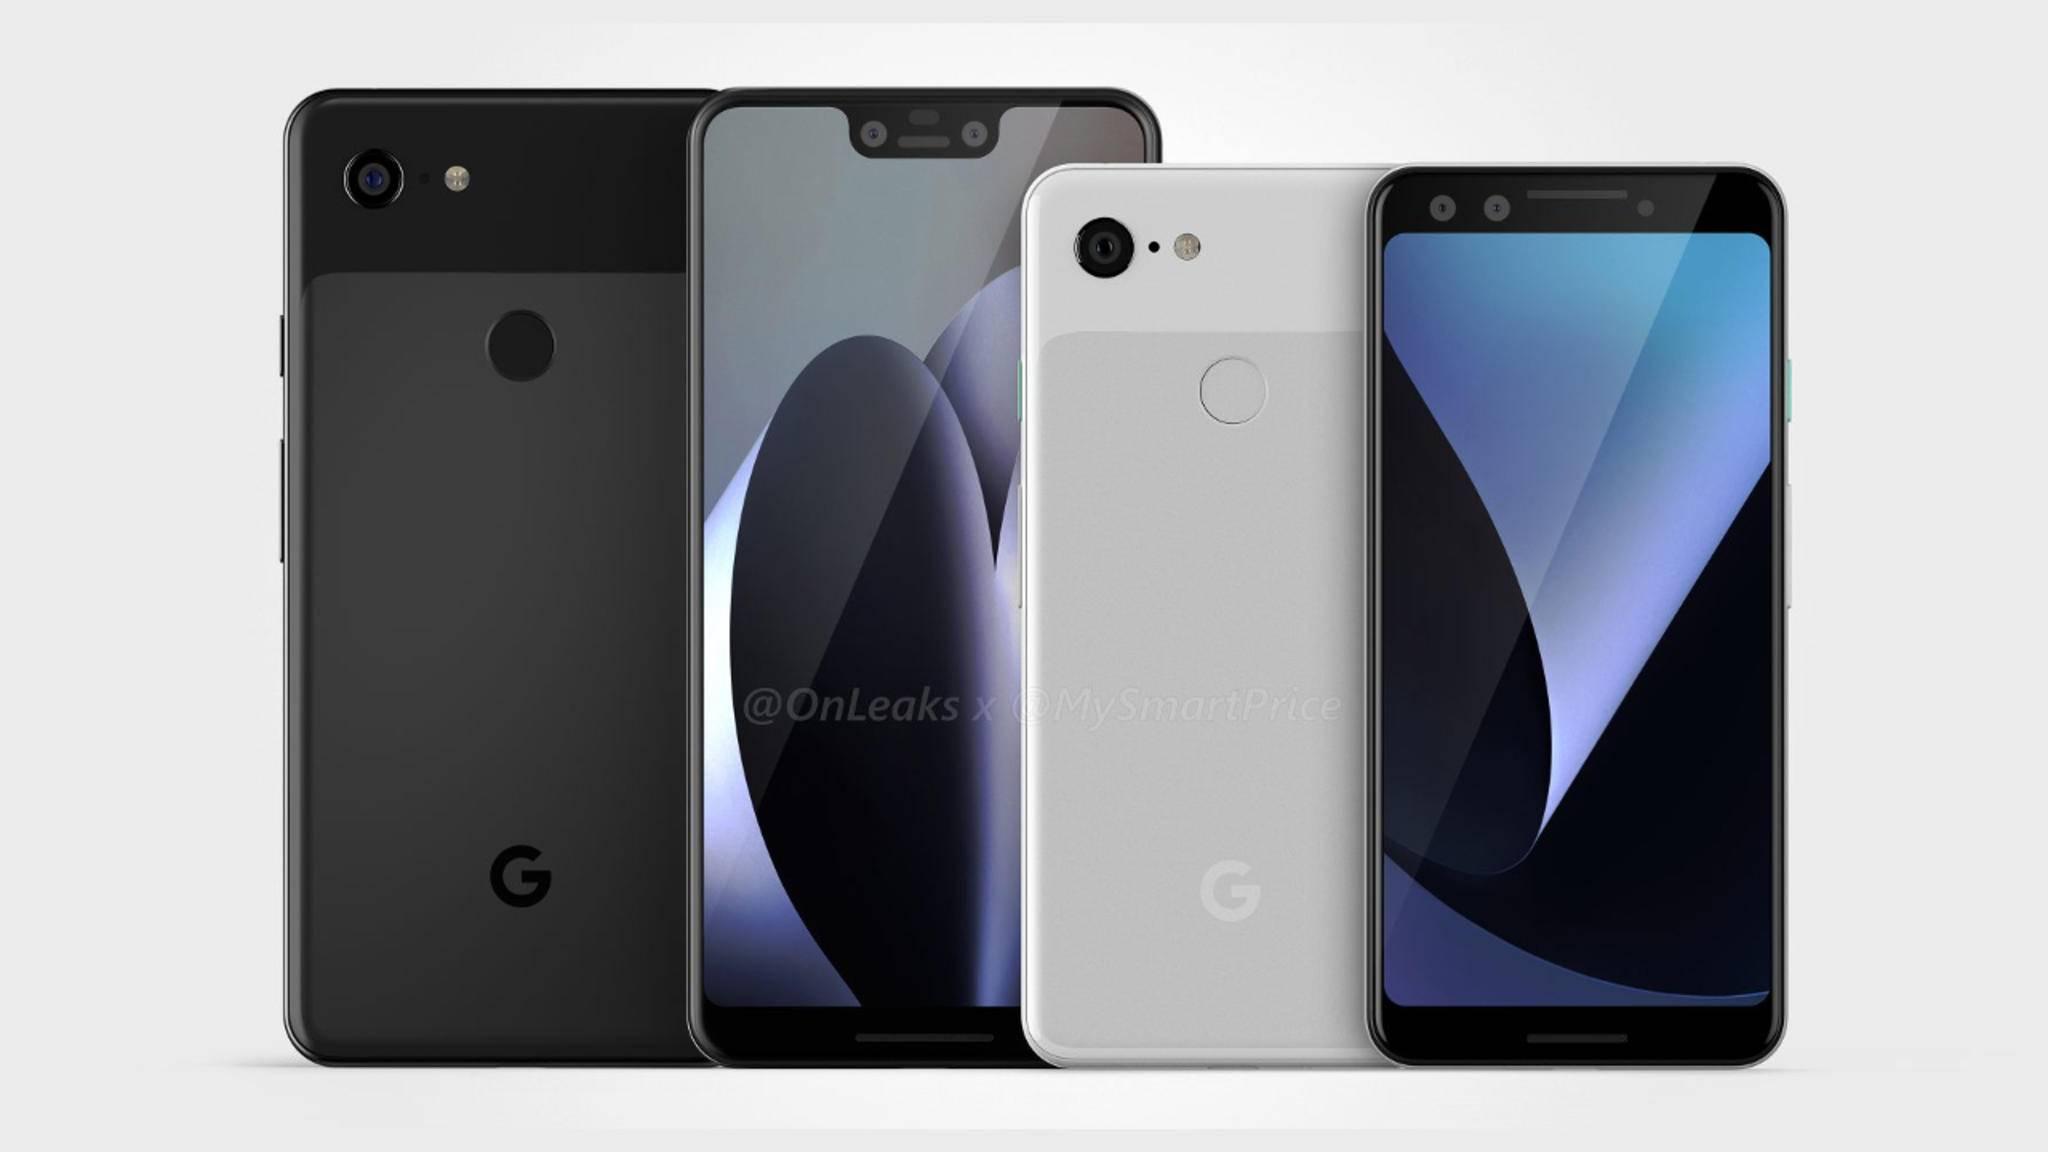 Google plant den Launch-Event für das Pixel 3 offenbar am 4. Oktober.